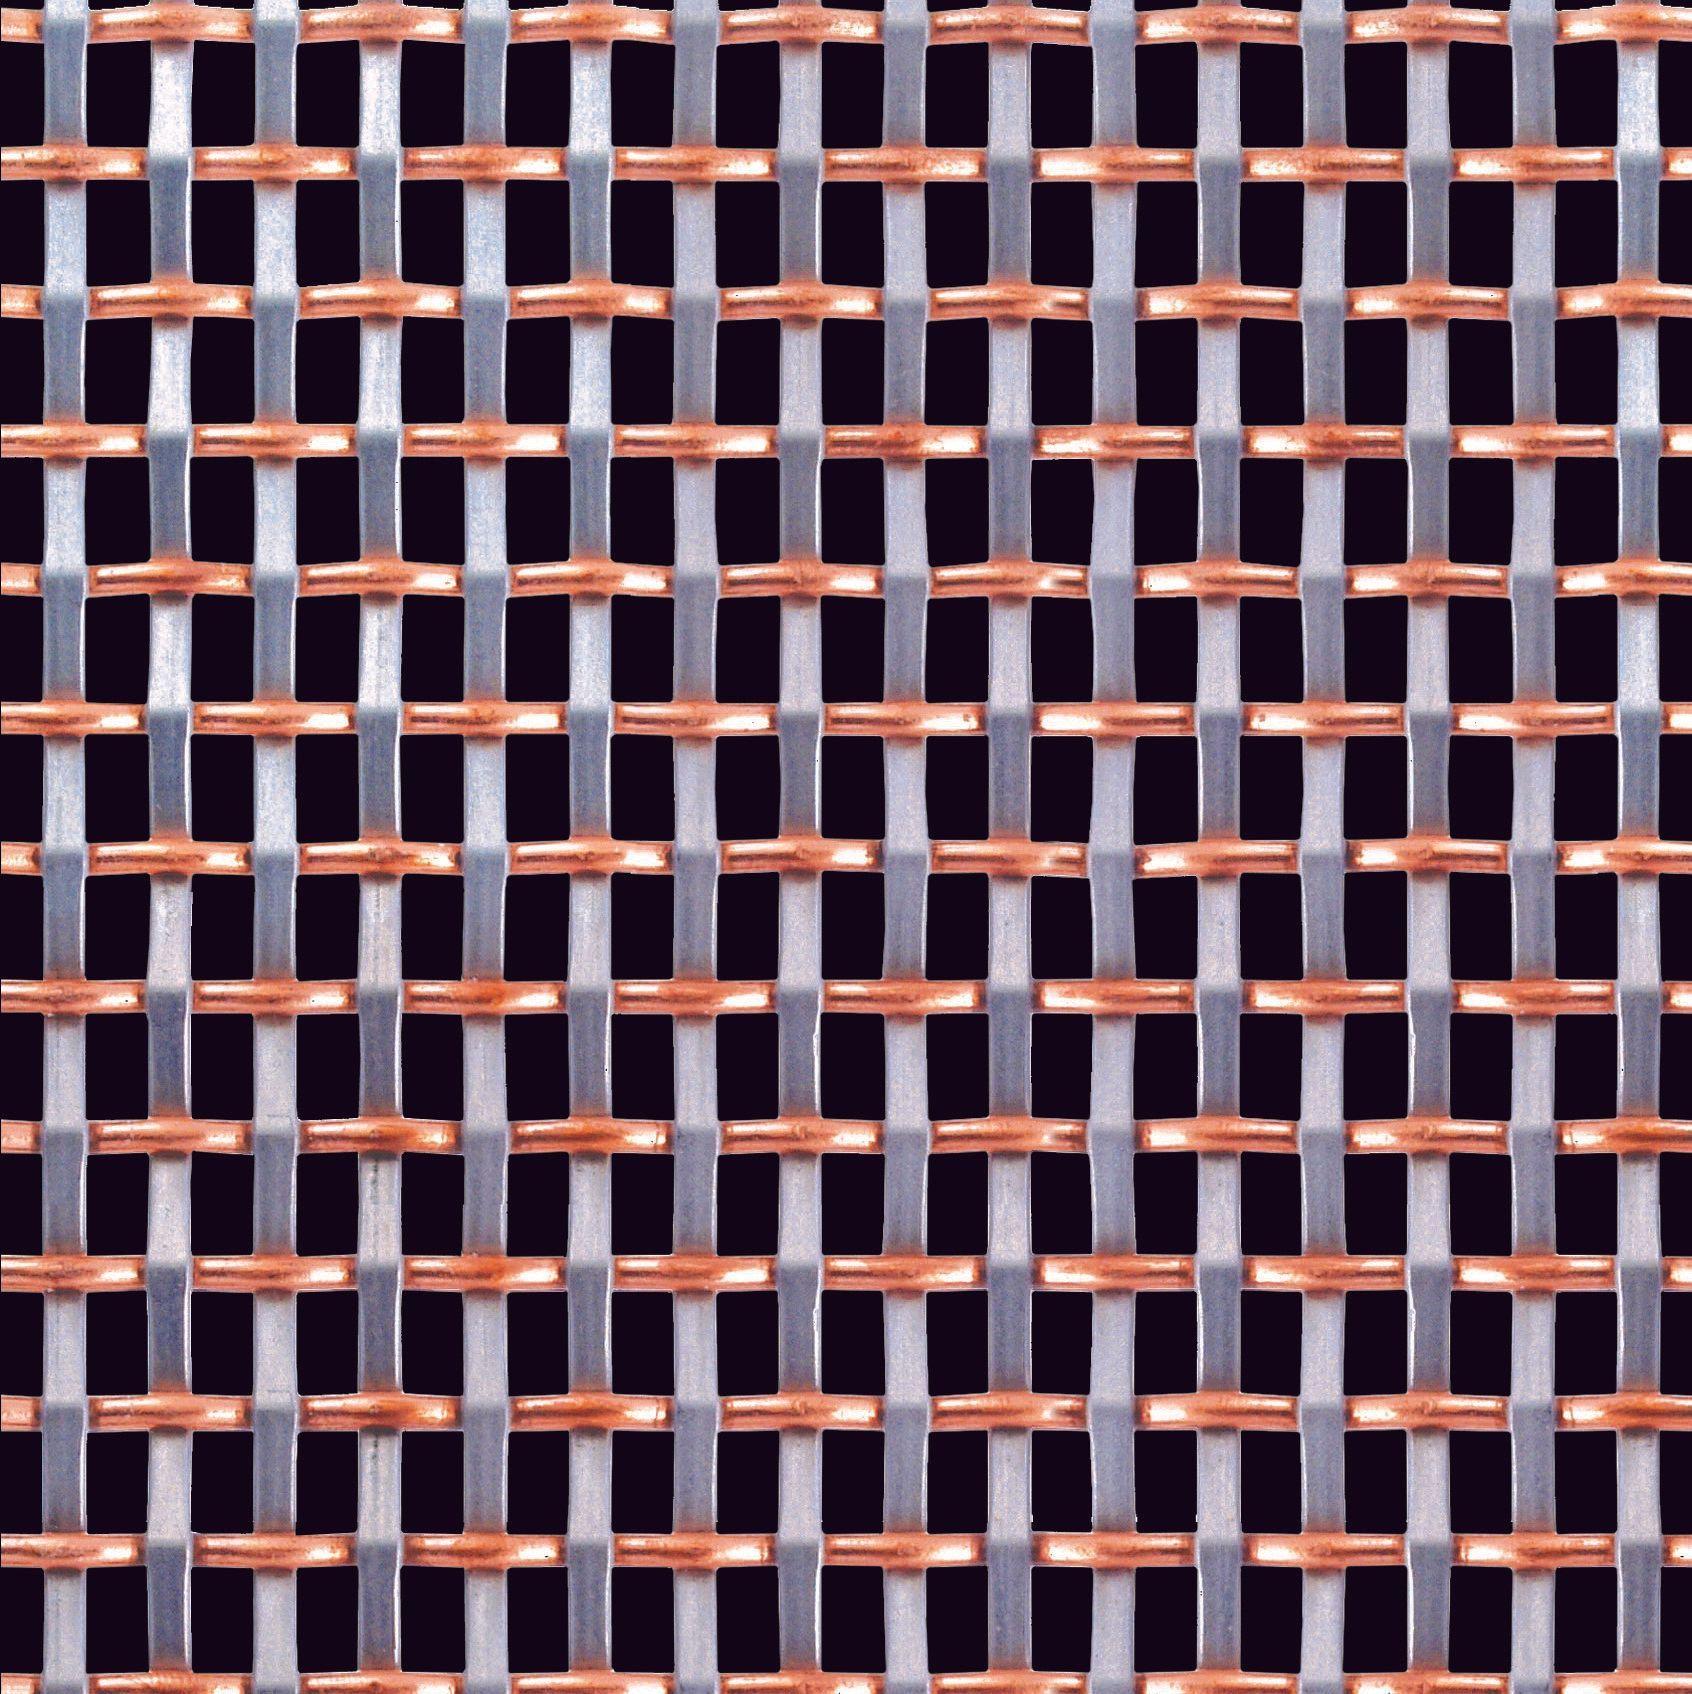 SHIRE 8148 series designer mesh